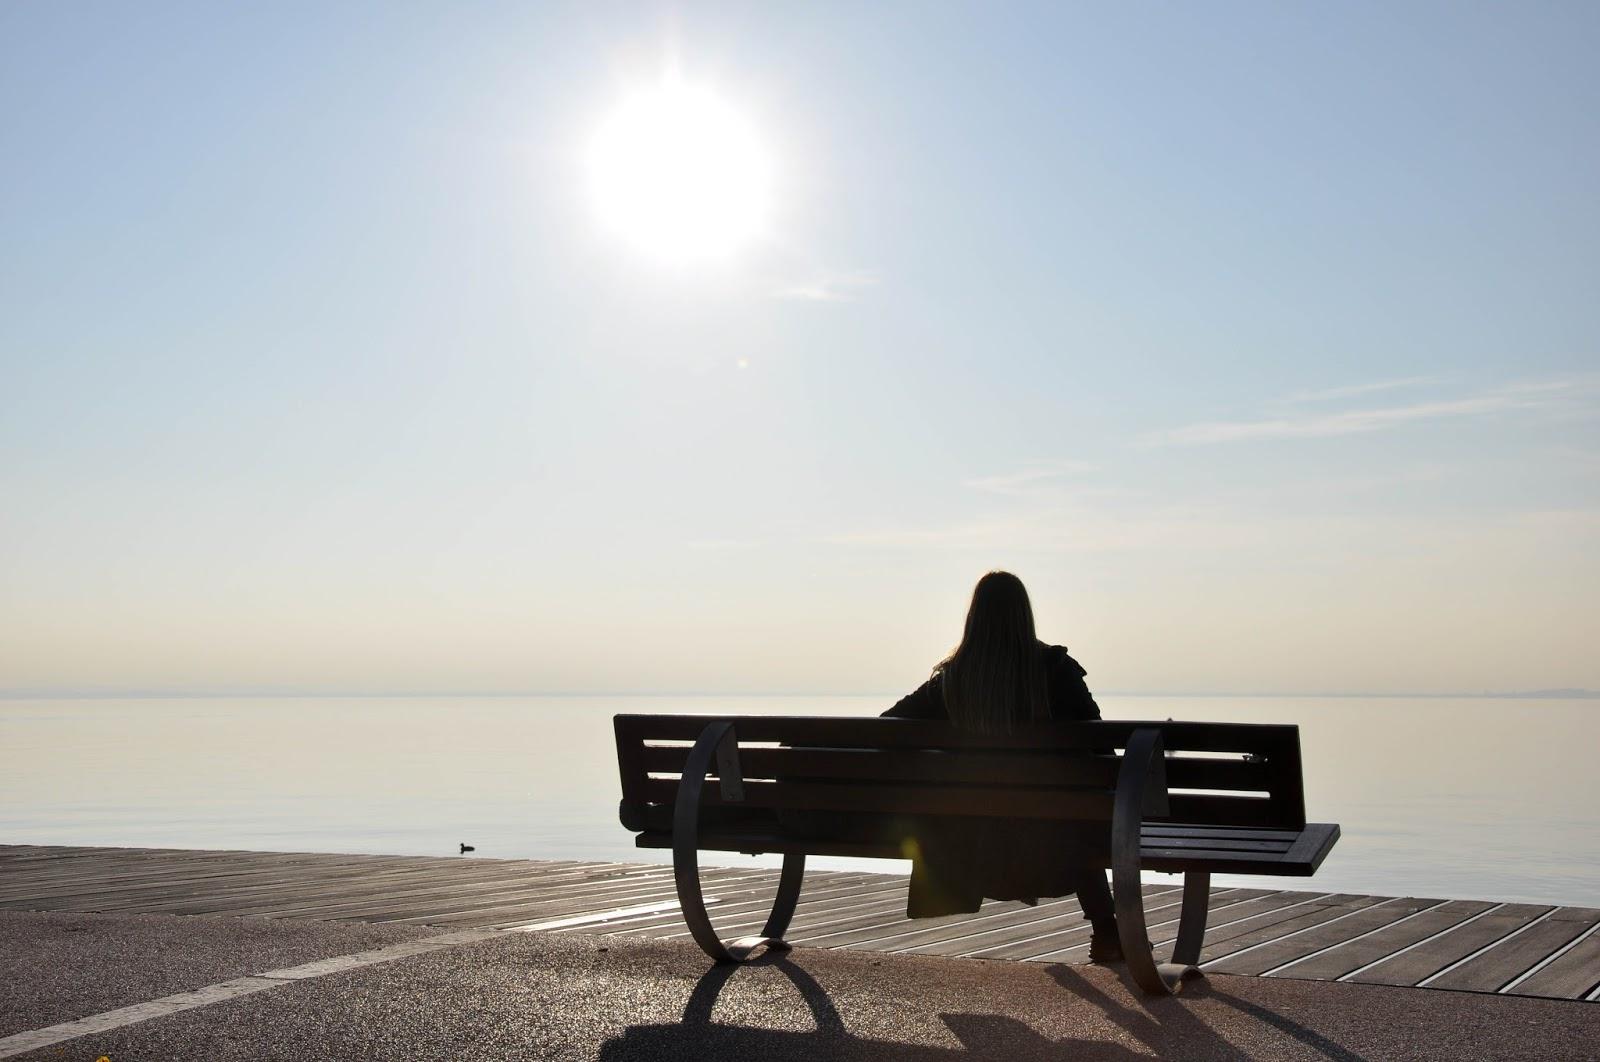 Bench and a girl, Bardolino, Lake Garda, Italy